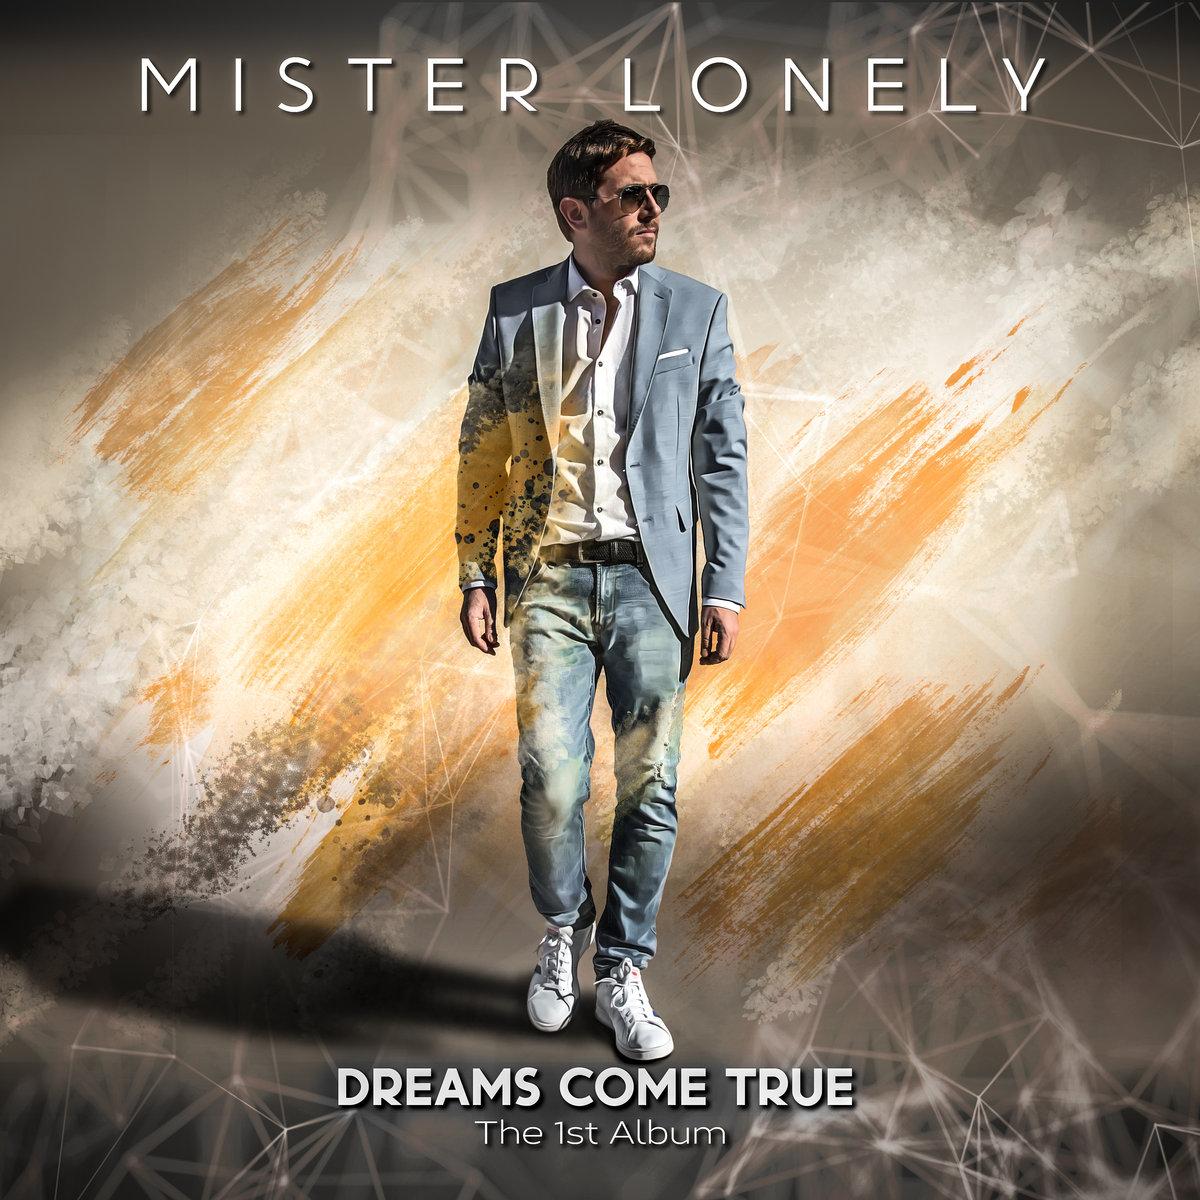 Mister Lonely - Locomotion Nights - Italo Tipp!